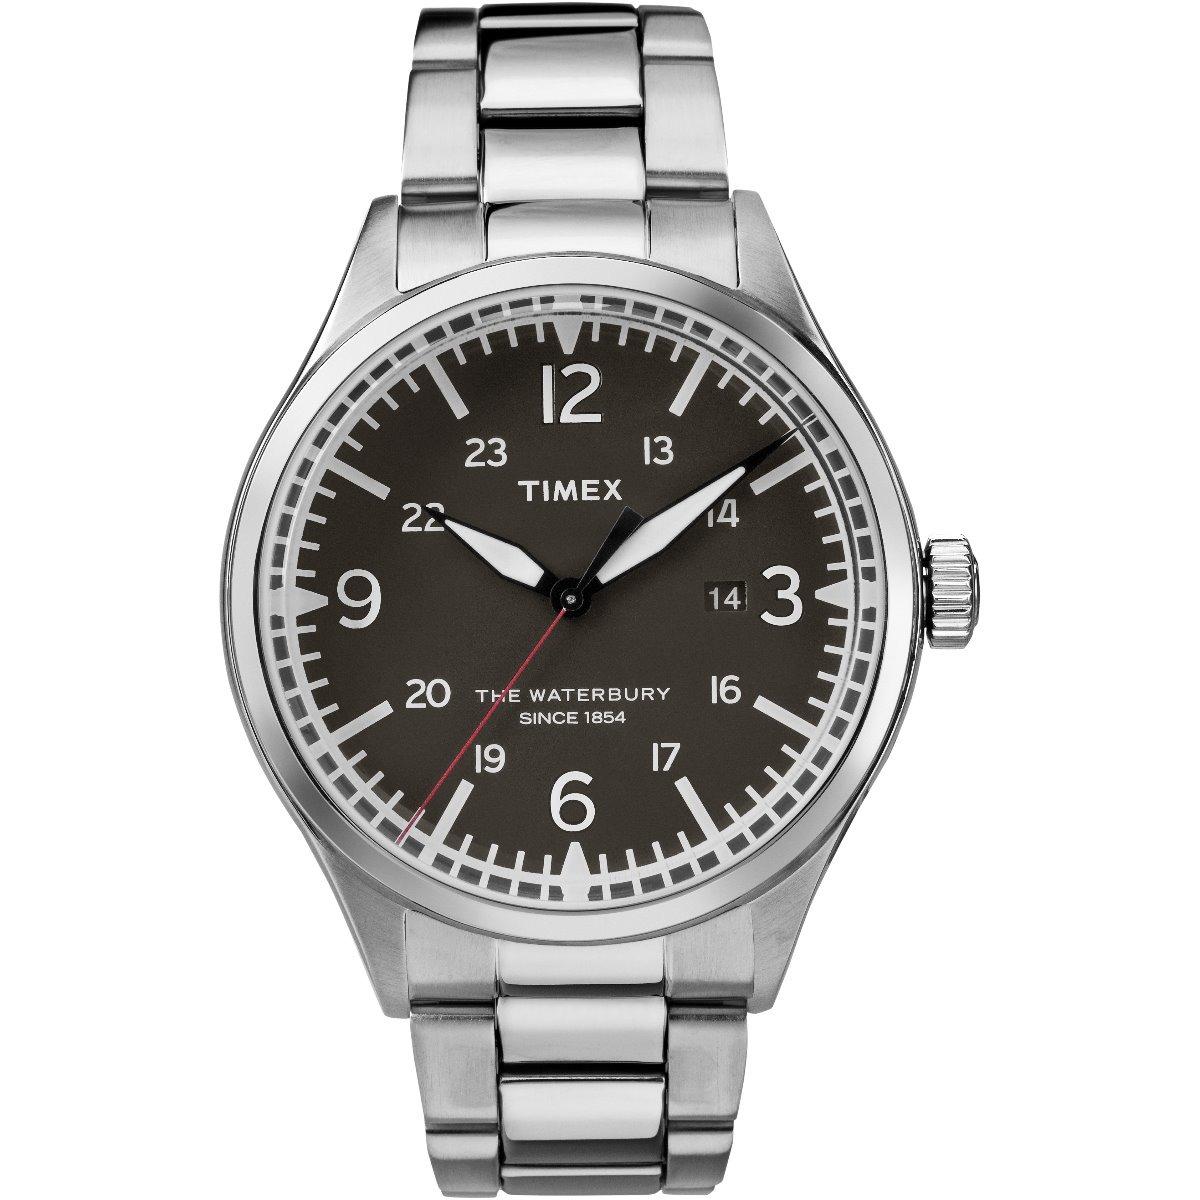 cd39673bc50a reloj timex waterbury tw2r38700 plateado original caballero . Cargando zoom.